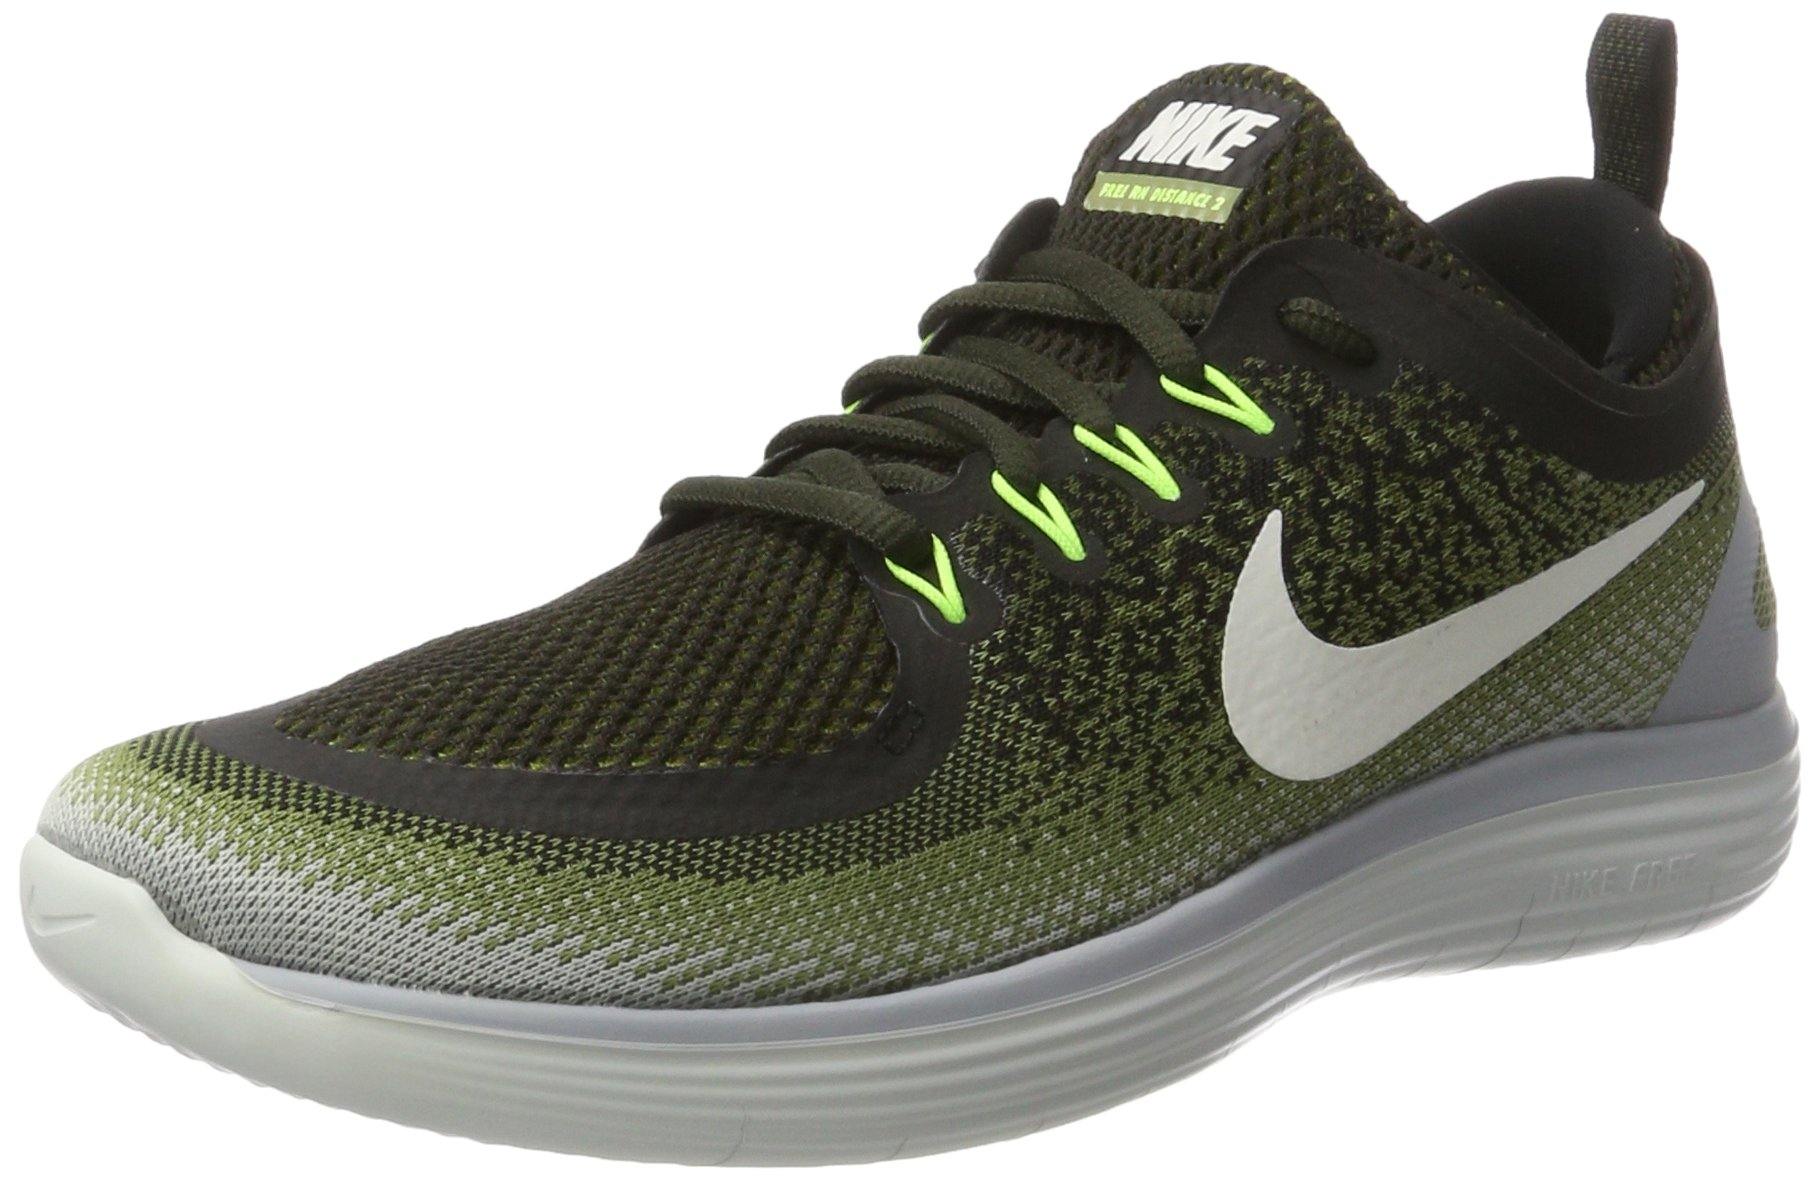 Nike Men's Free RN Distance 2 Legion Green White Palm Green 863775 300 (8.5)